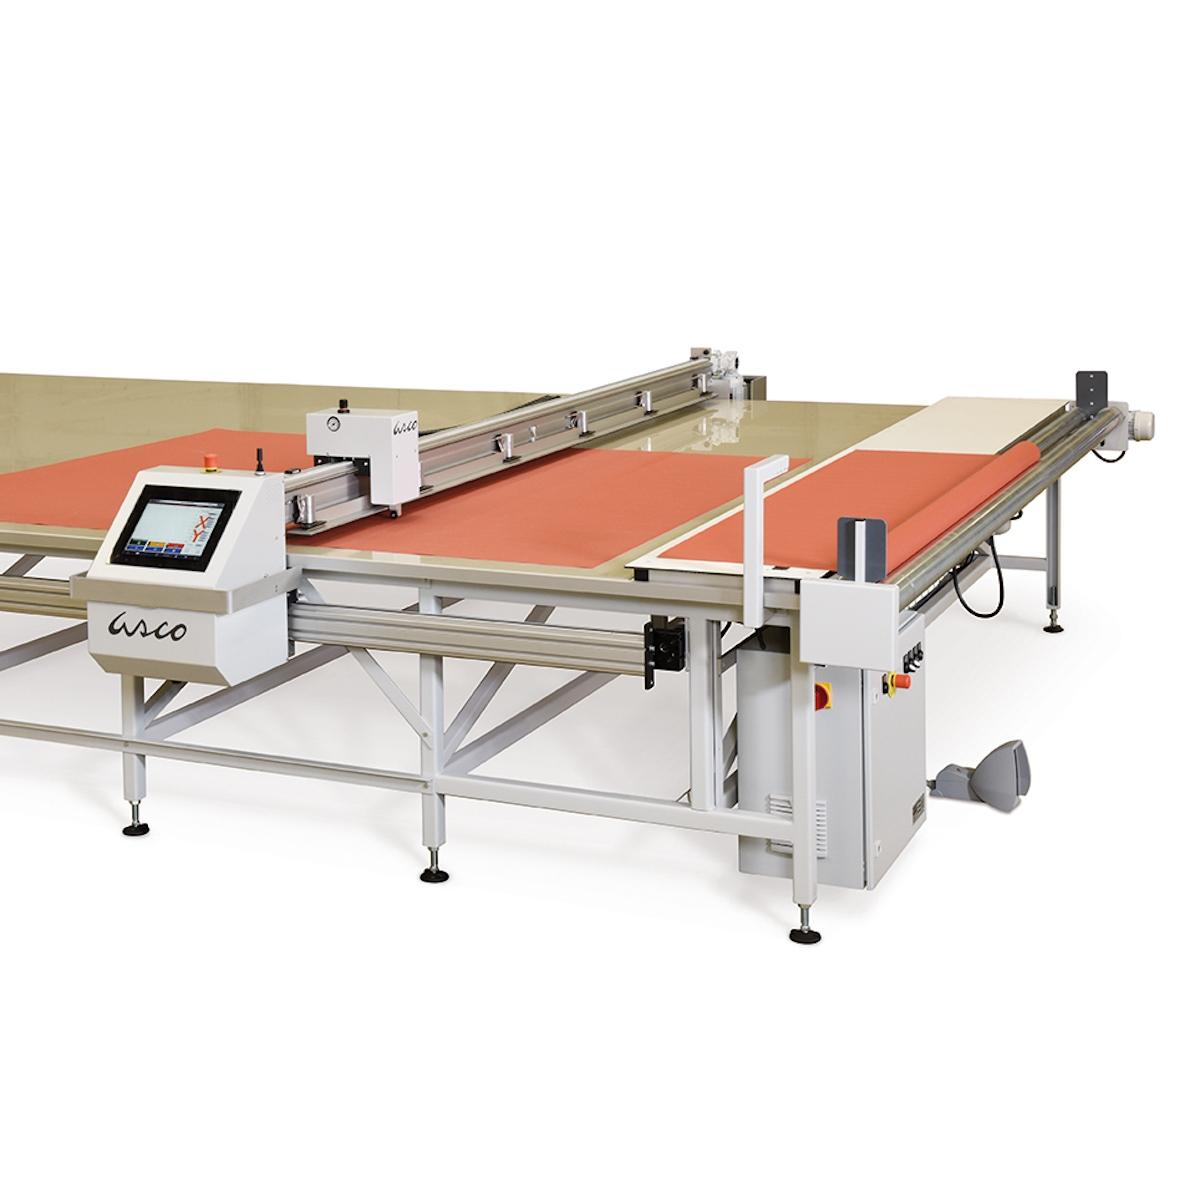 VX Cutting Table